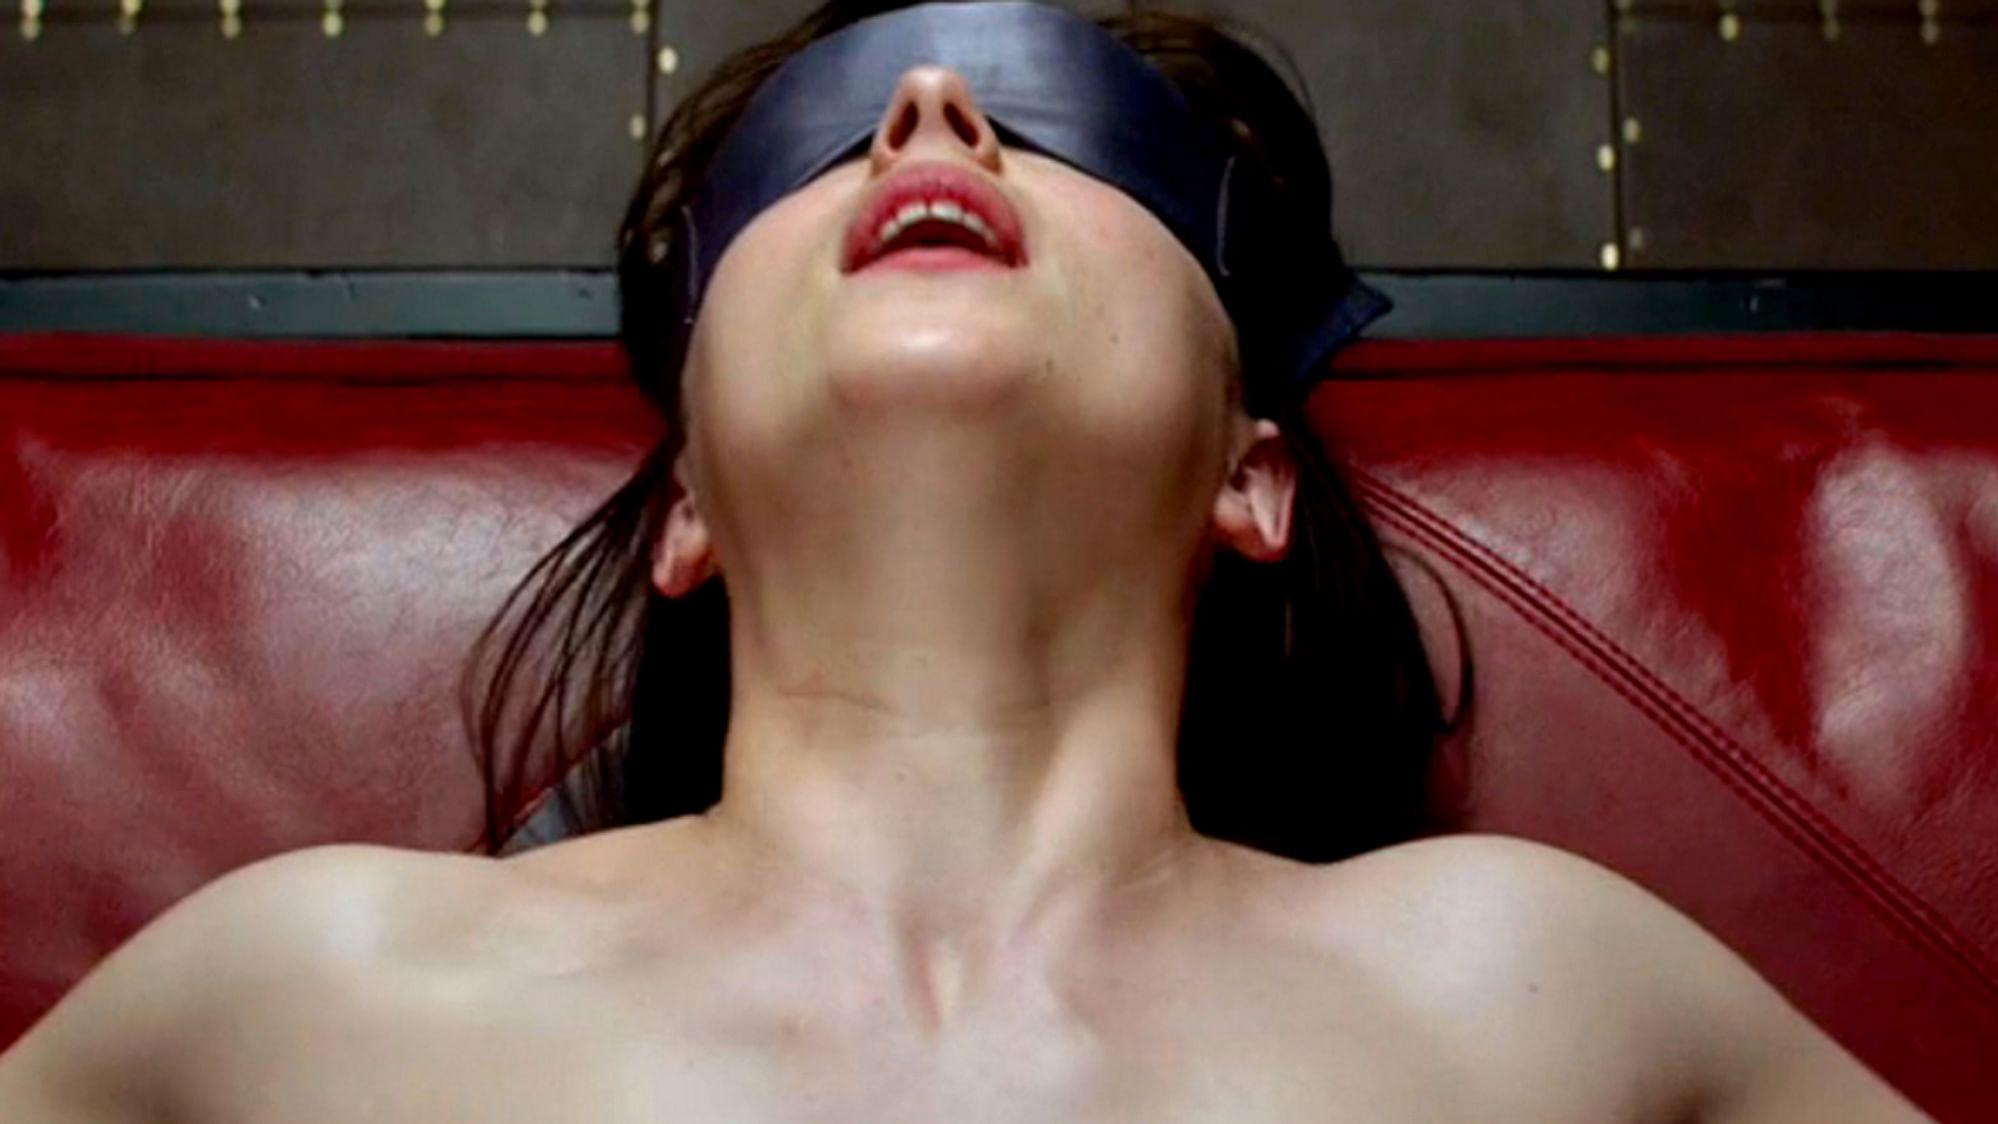 Female Orgasm Movies